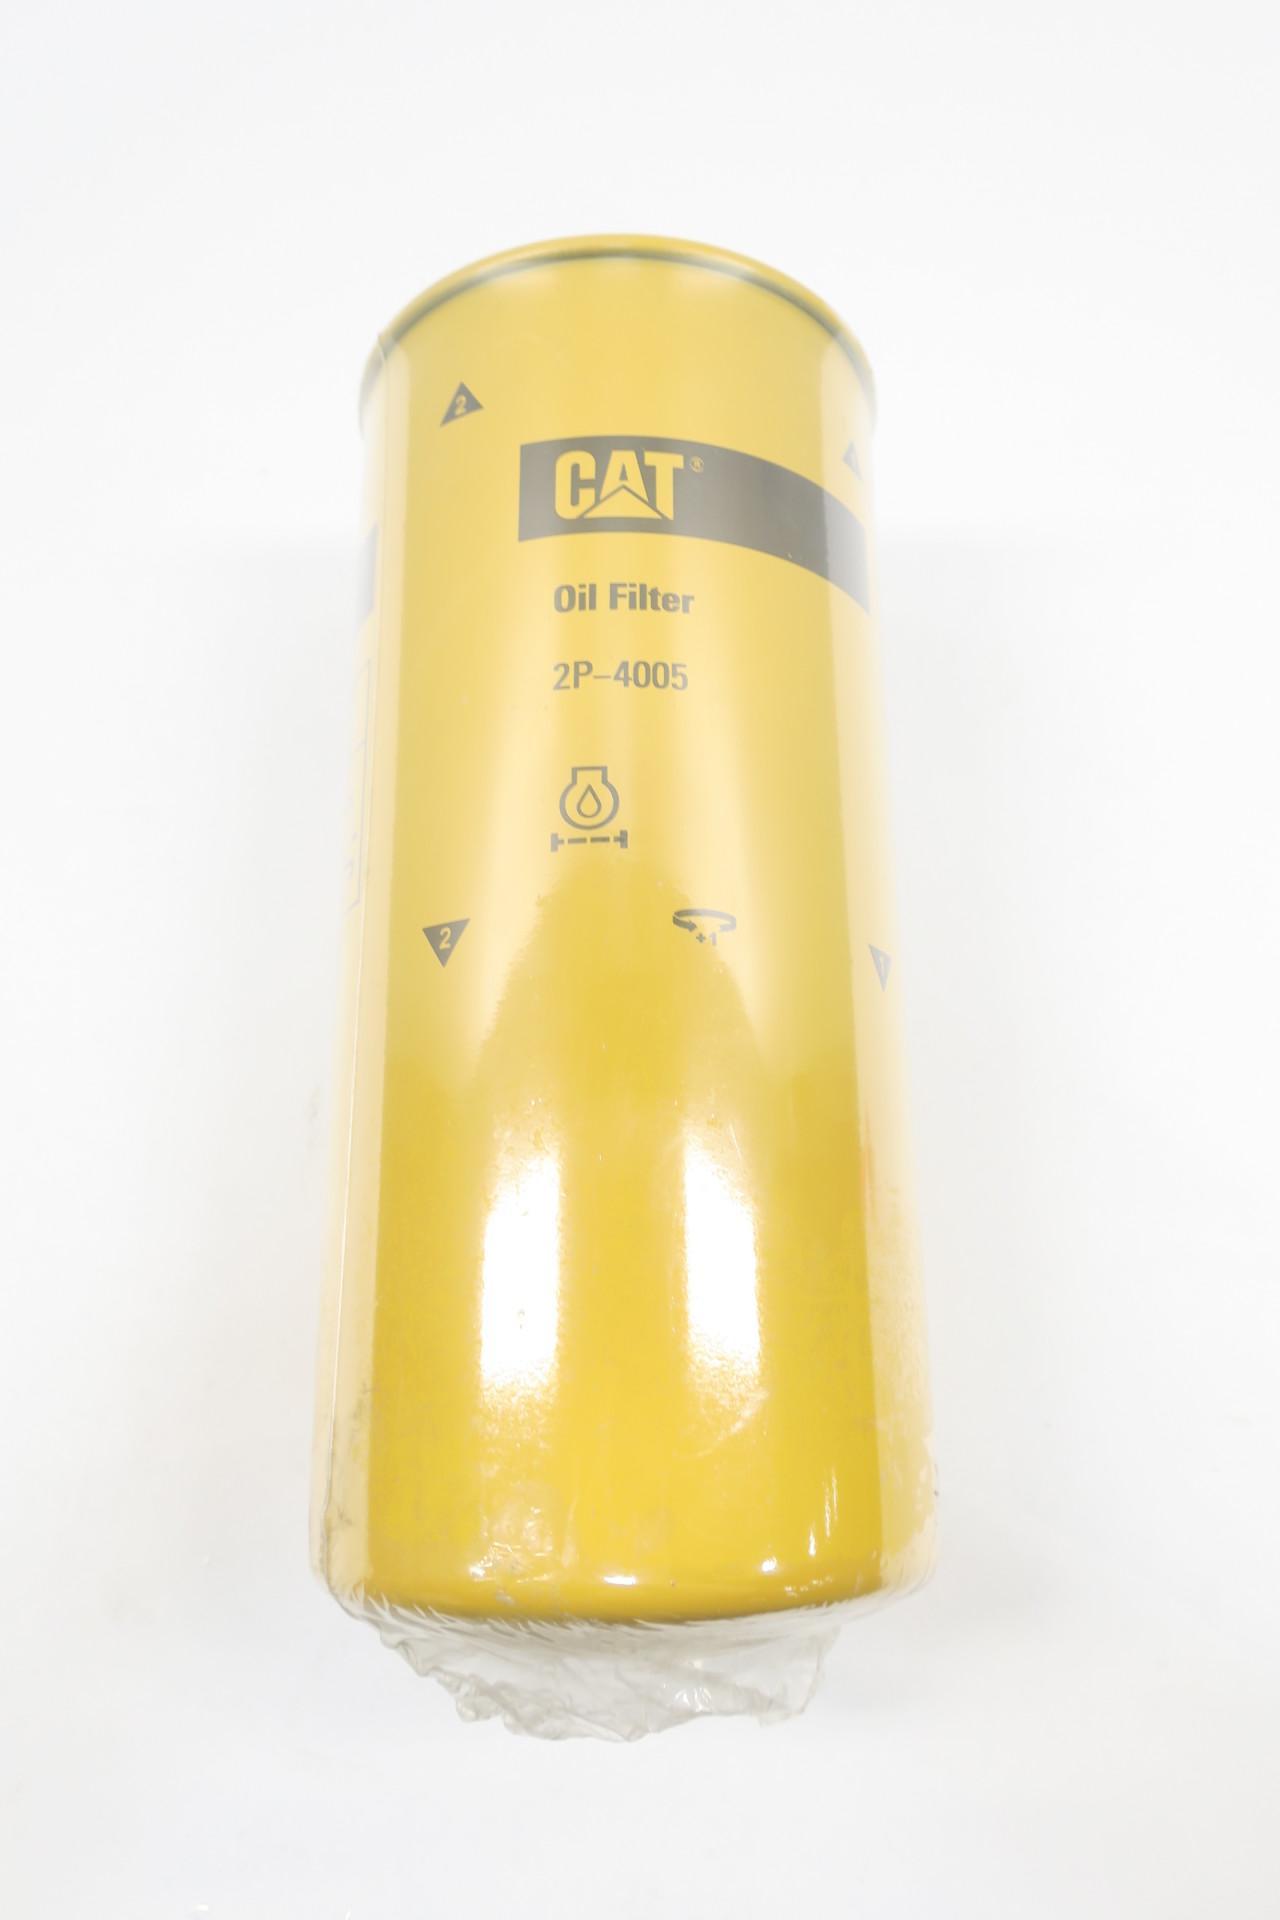 Caterpillar Cat 2P-4005 Oil Filter